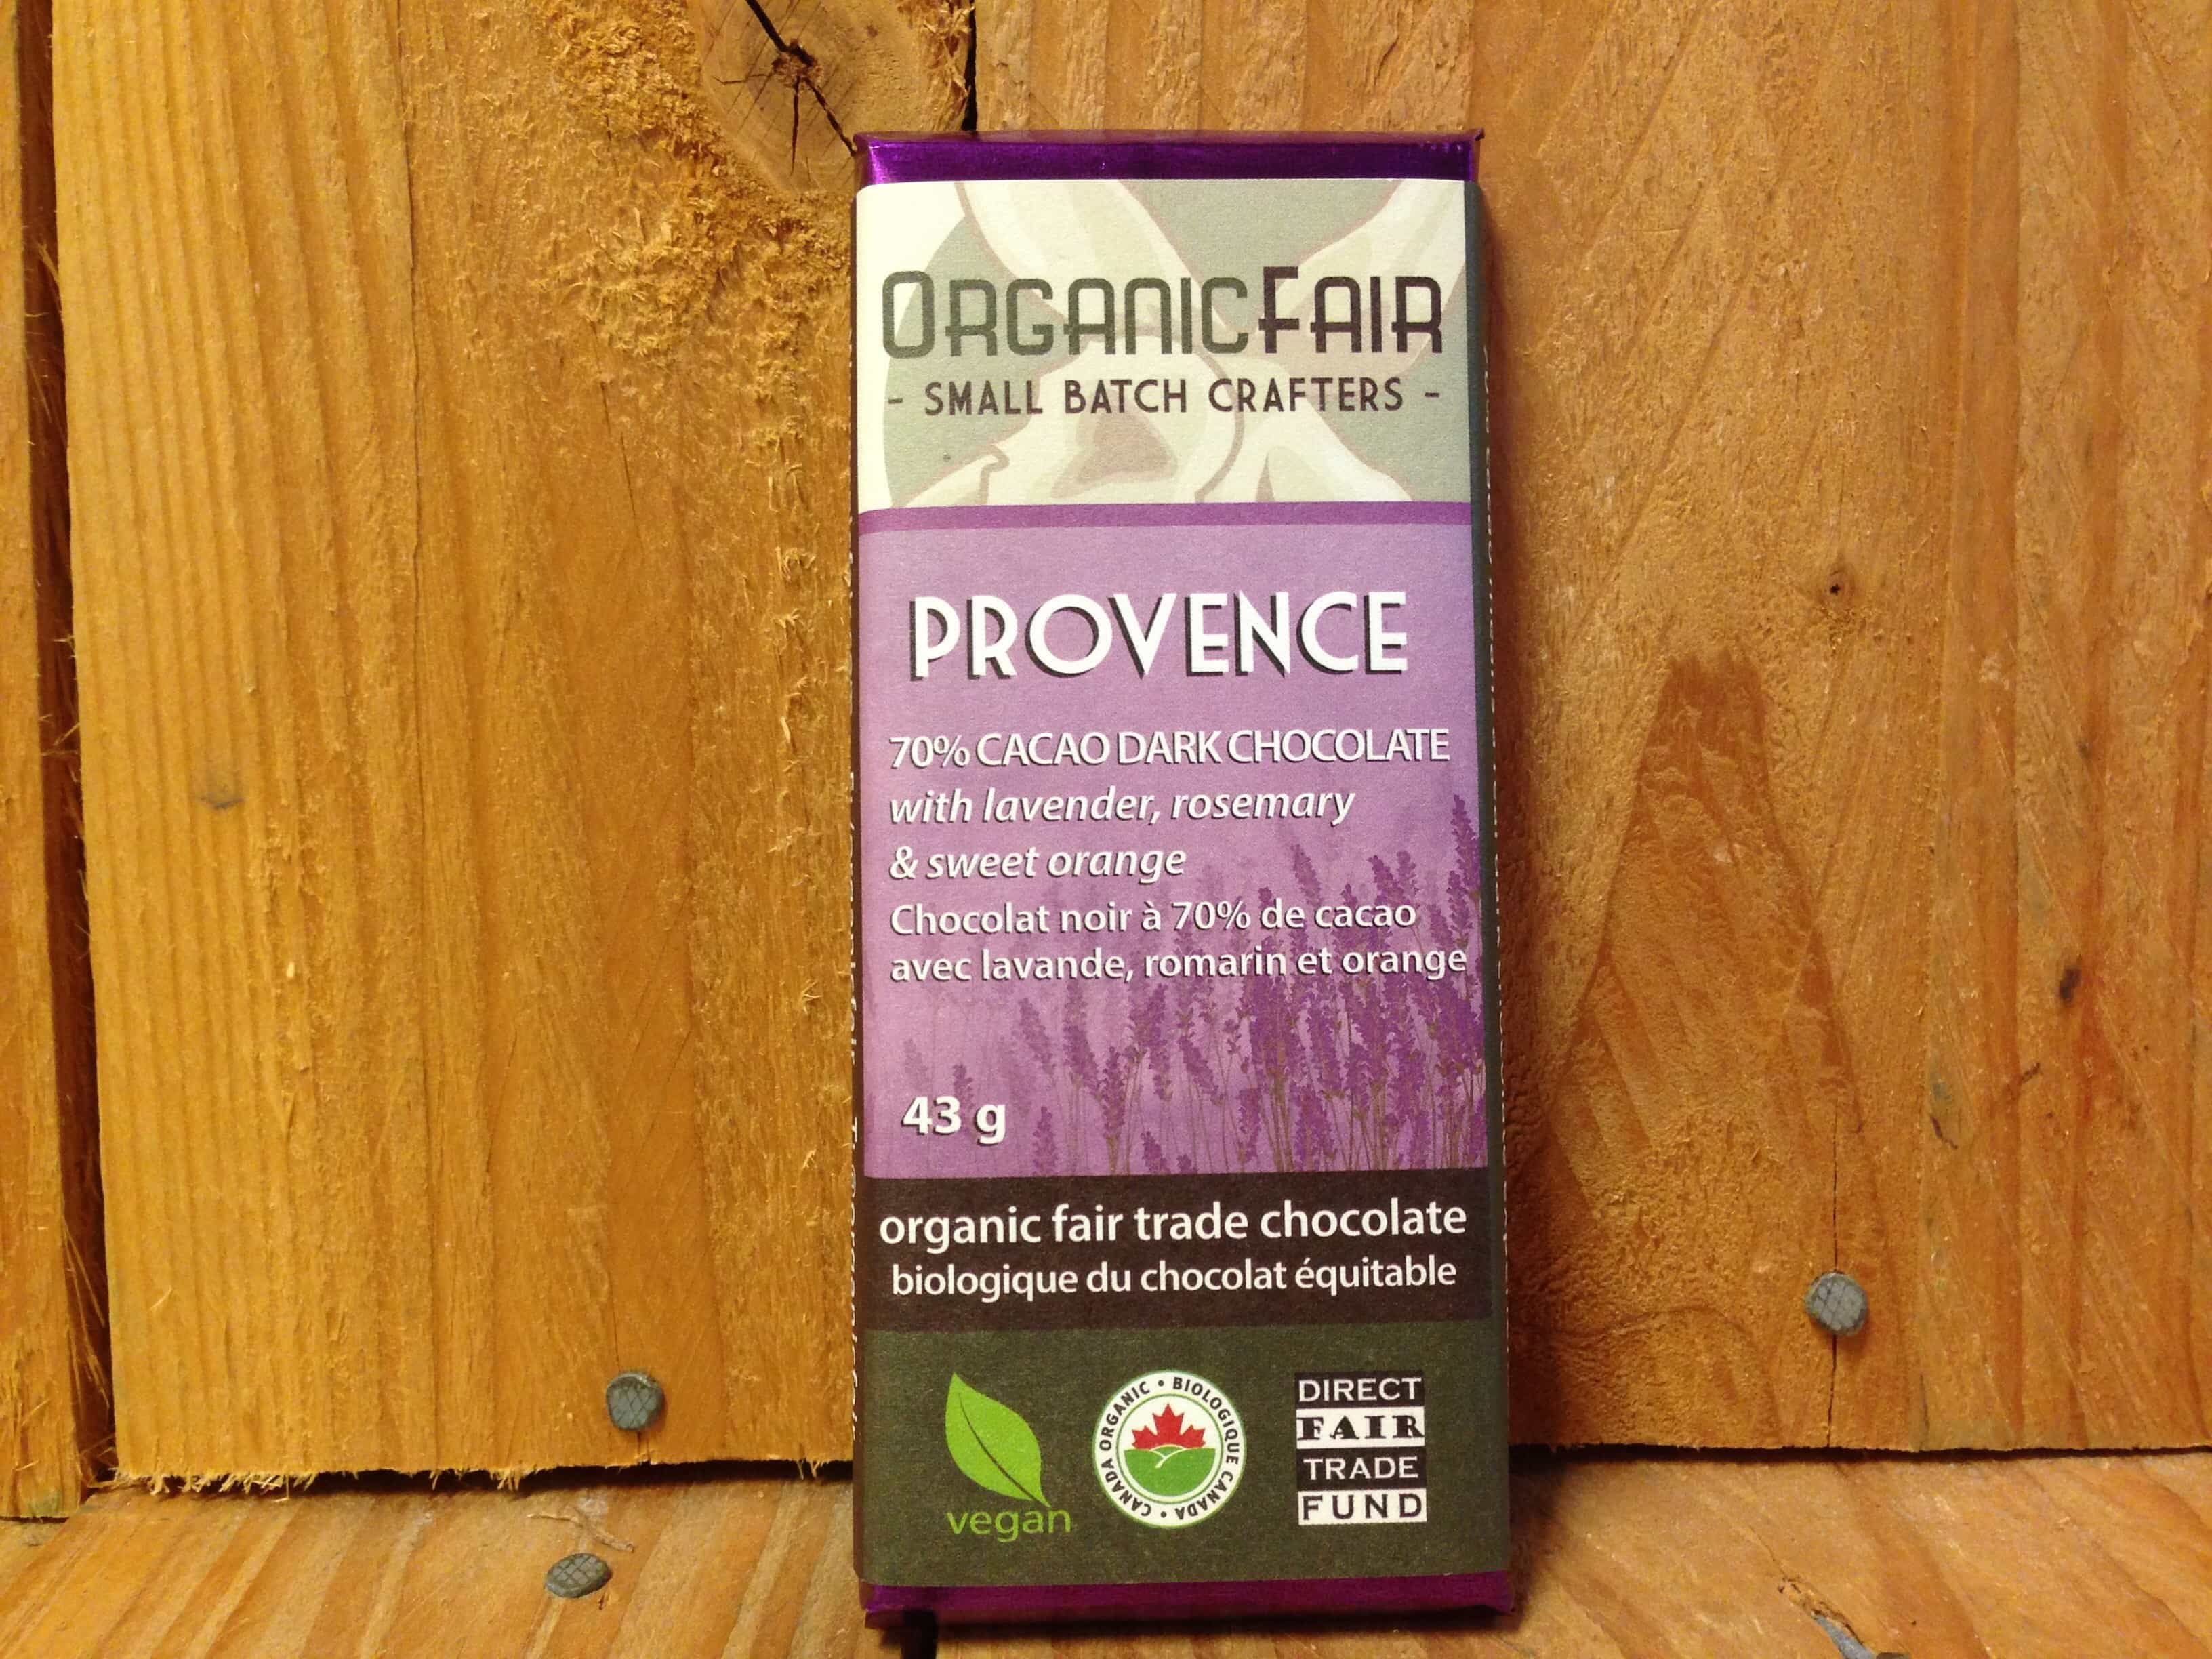 Organic Fair – Chocolate – Provence (43g)